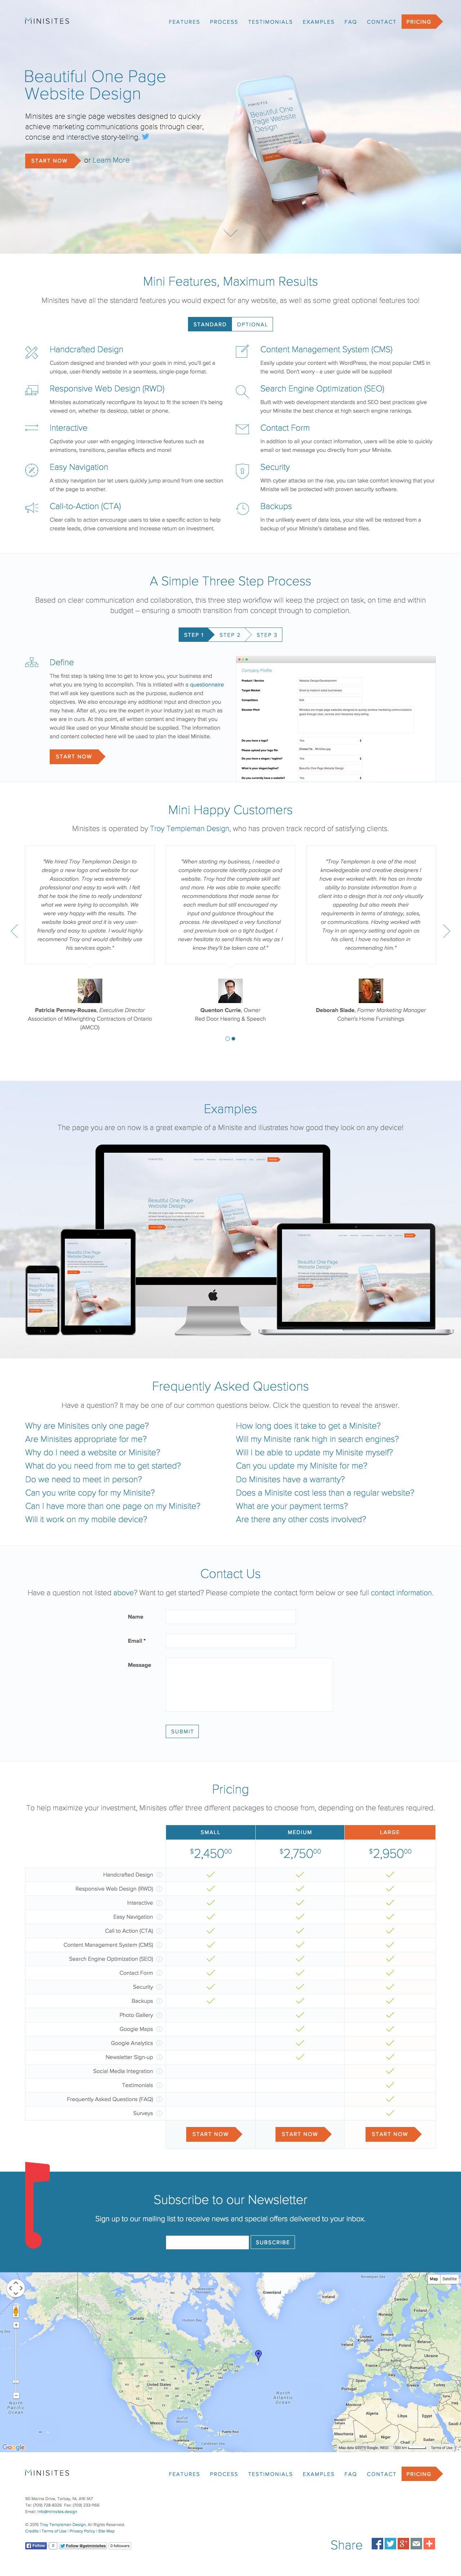 Minisites Website Screenshot